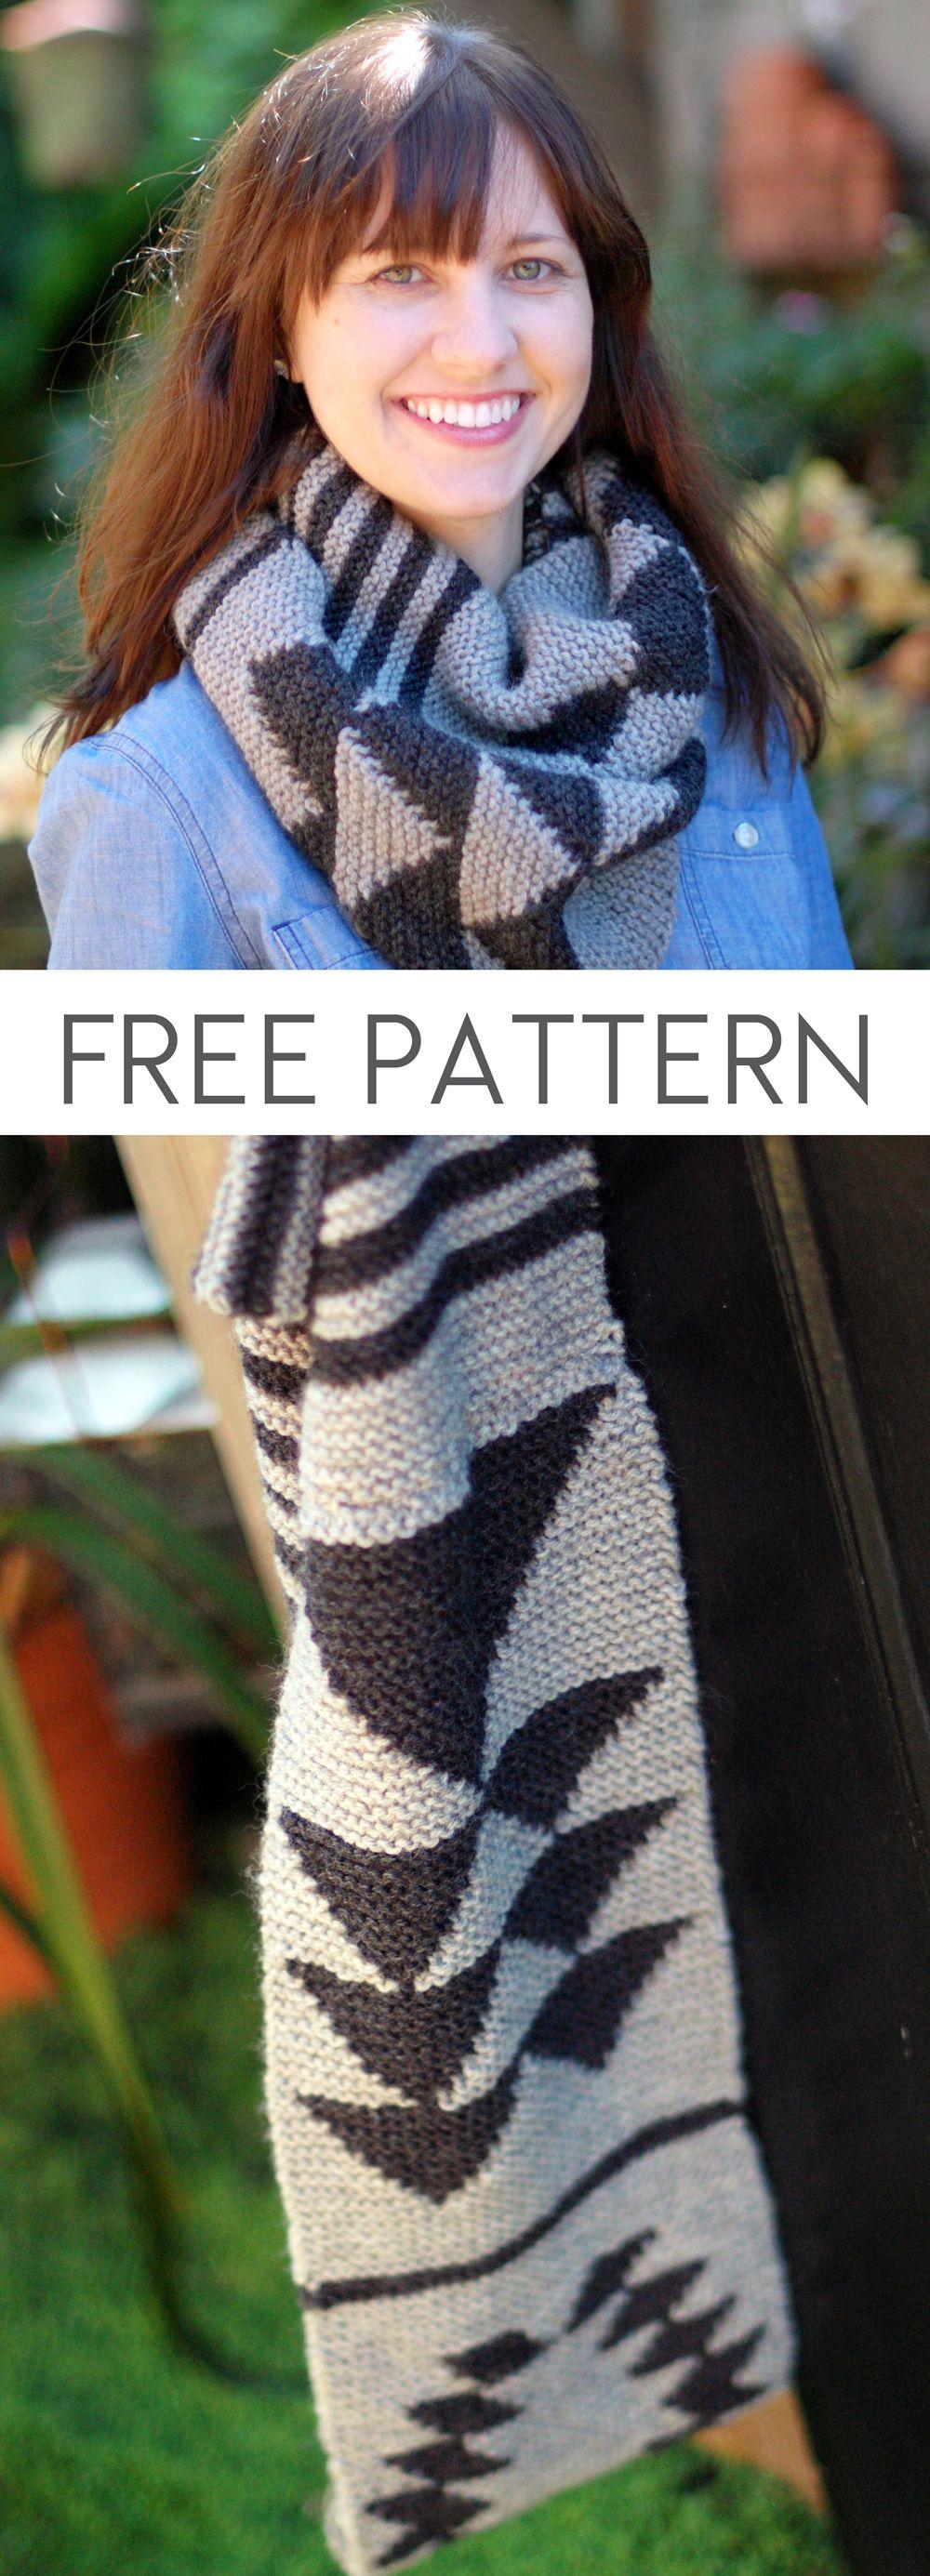 Free Knitting Pattern: Aztec Infinity Scarf << inspiration scarf Cowichan garterstitch scarf